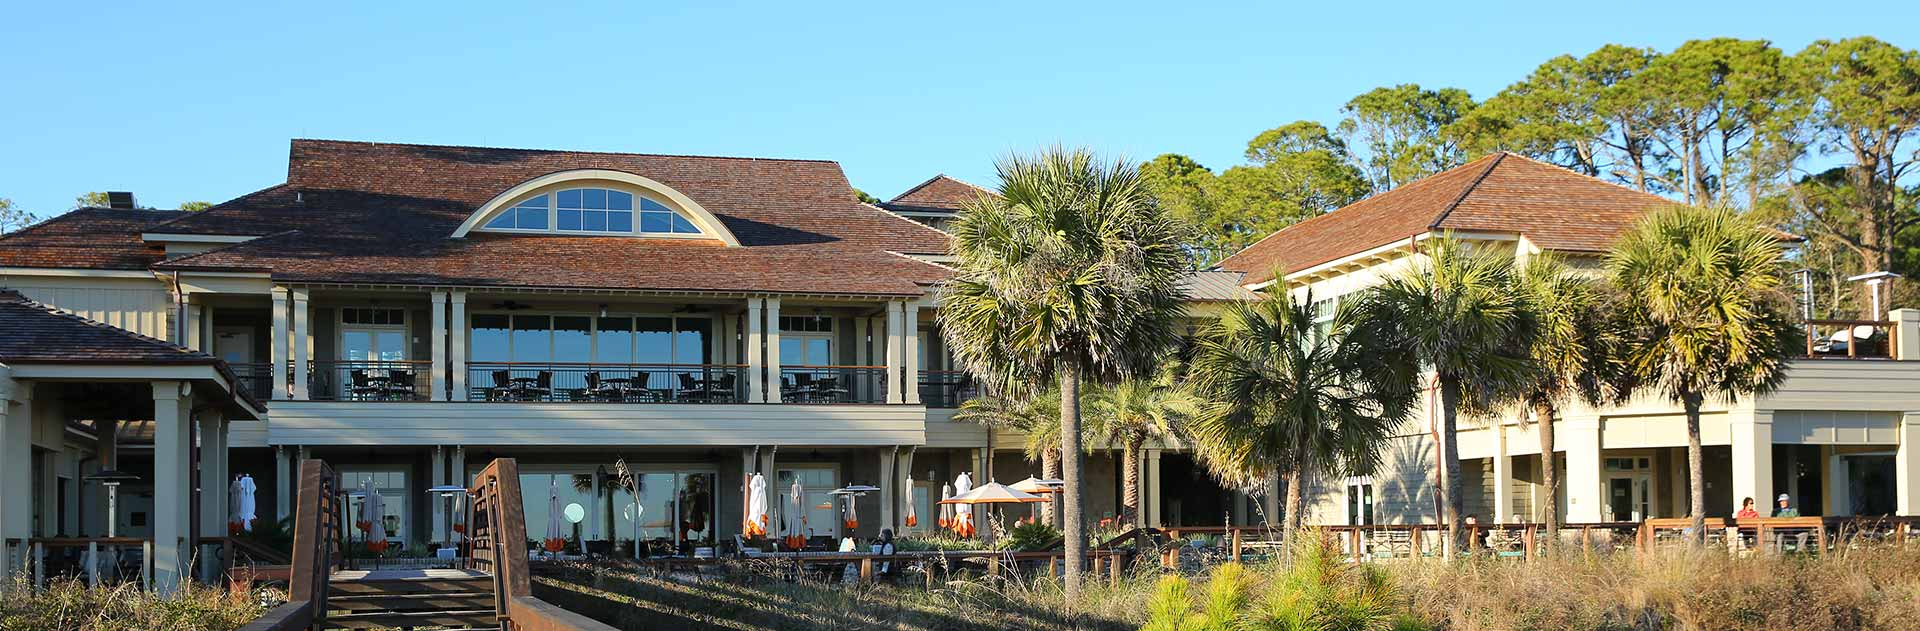 Hilton Head Island Home For Rent